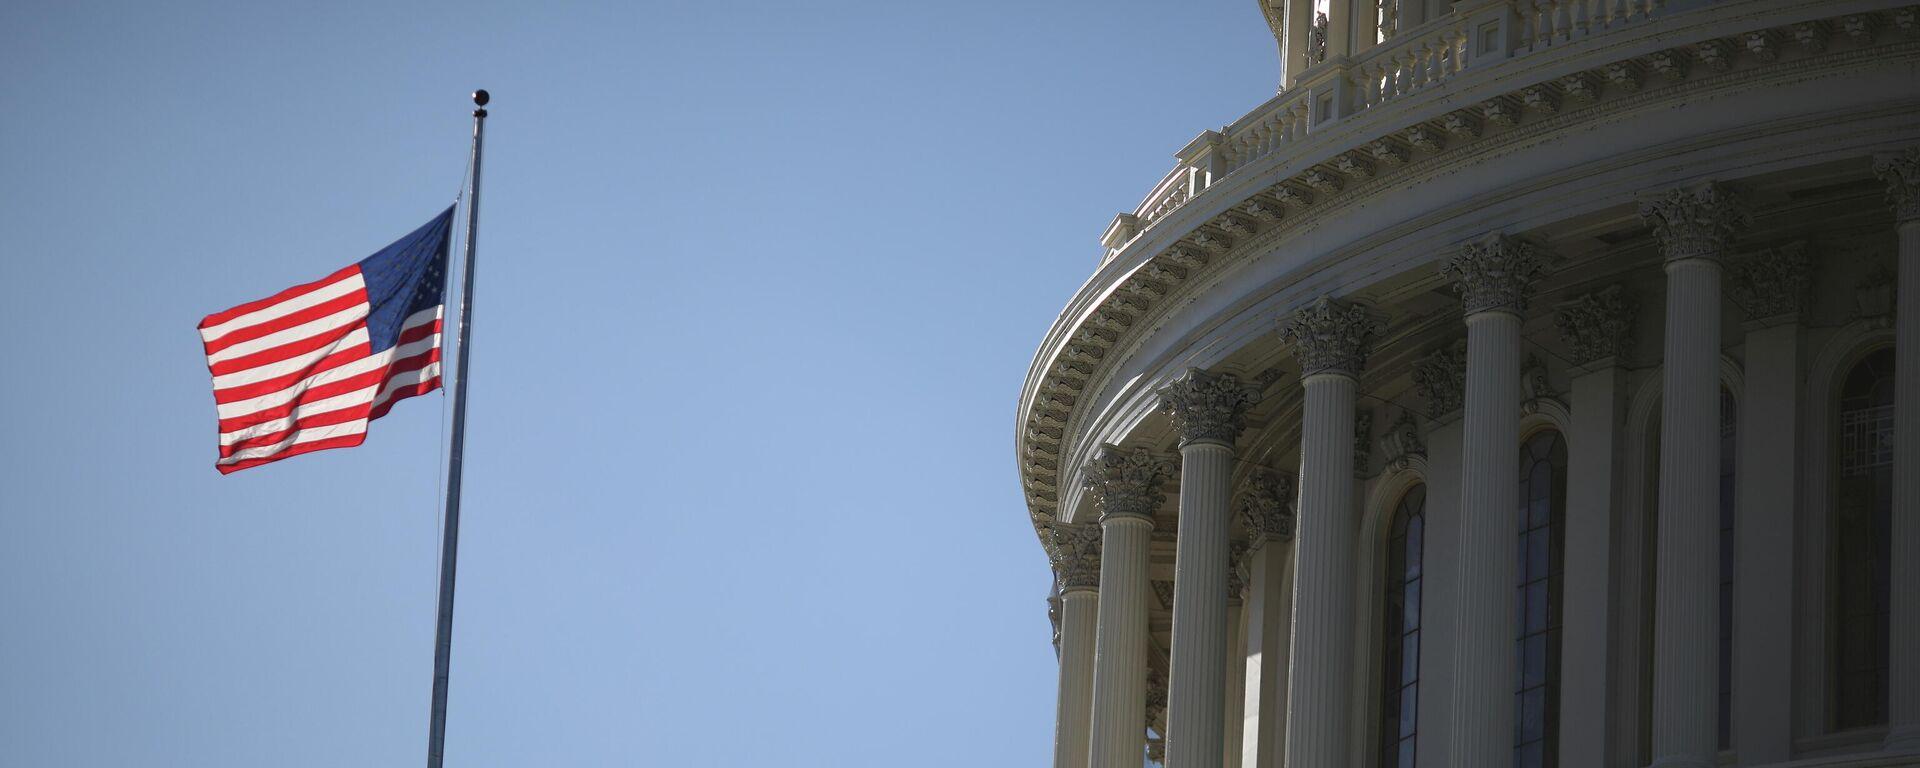 Das Kapitol in Washington, D.C. – Sitz des US-Kongresses - SNA, 1920, 28.12.2020